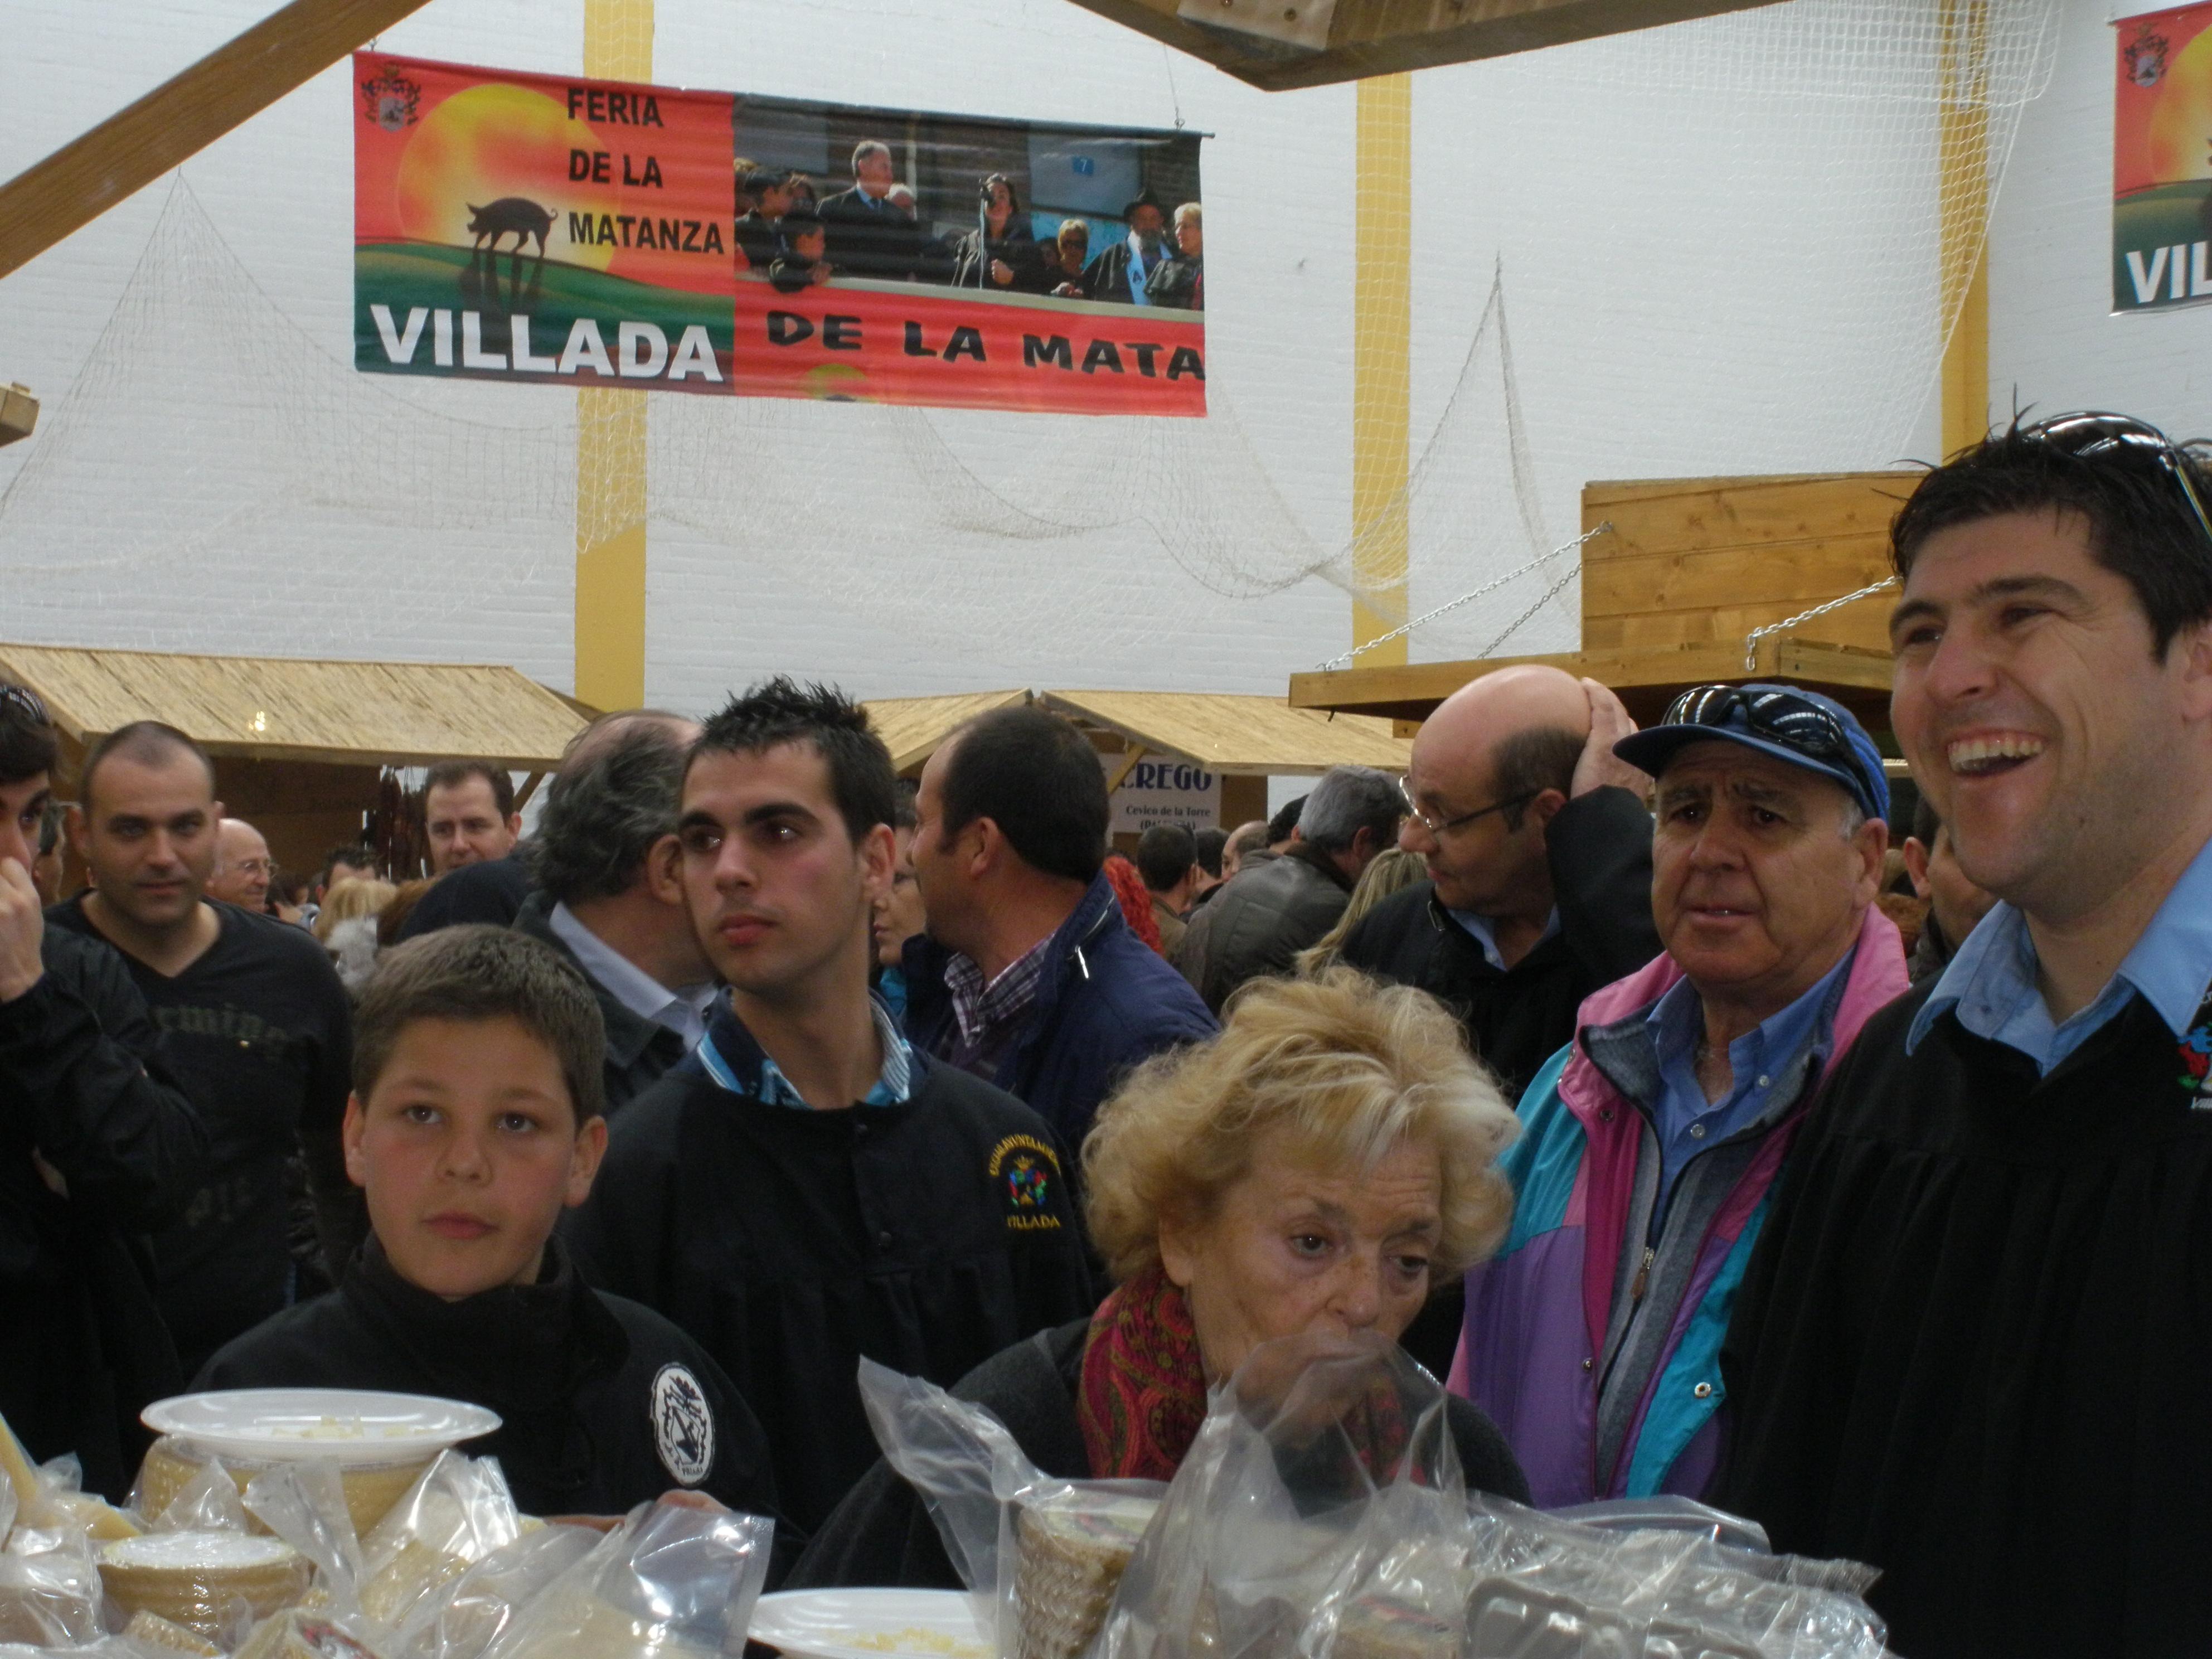 Feria de la Matanza 2013